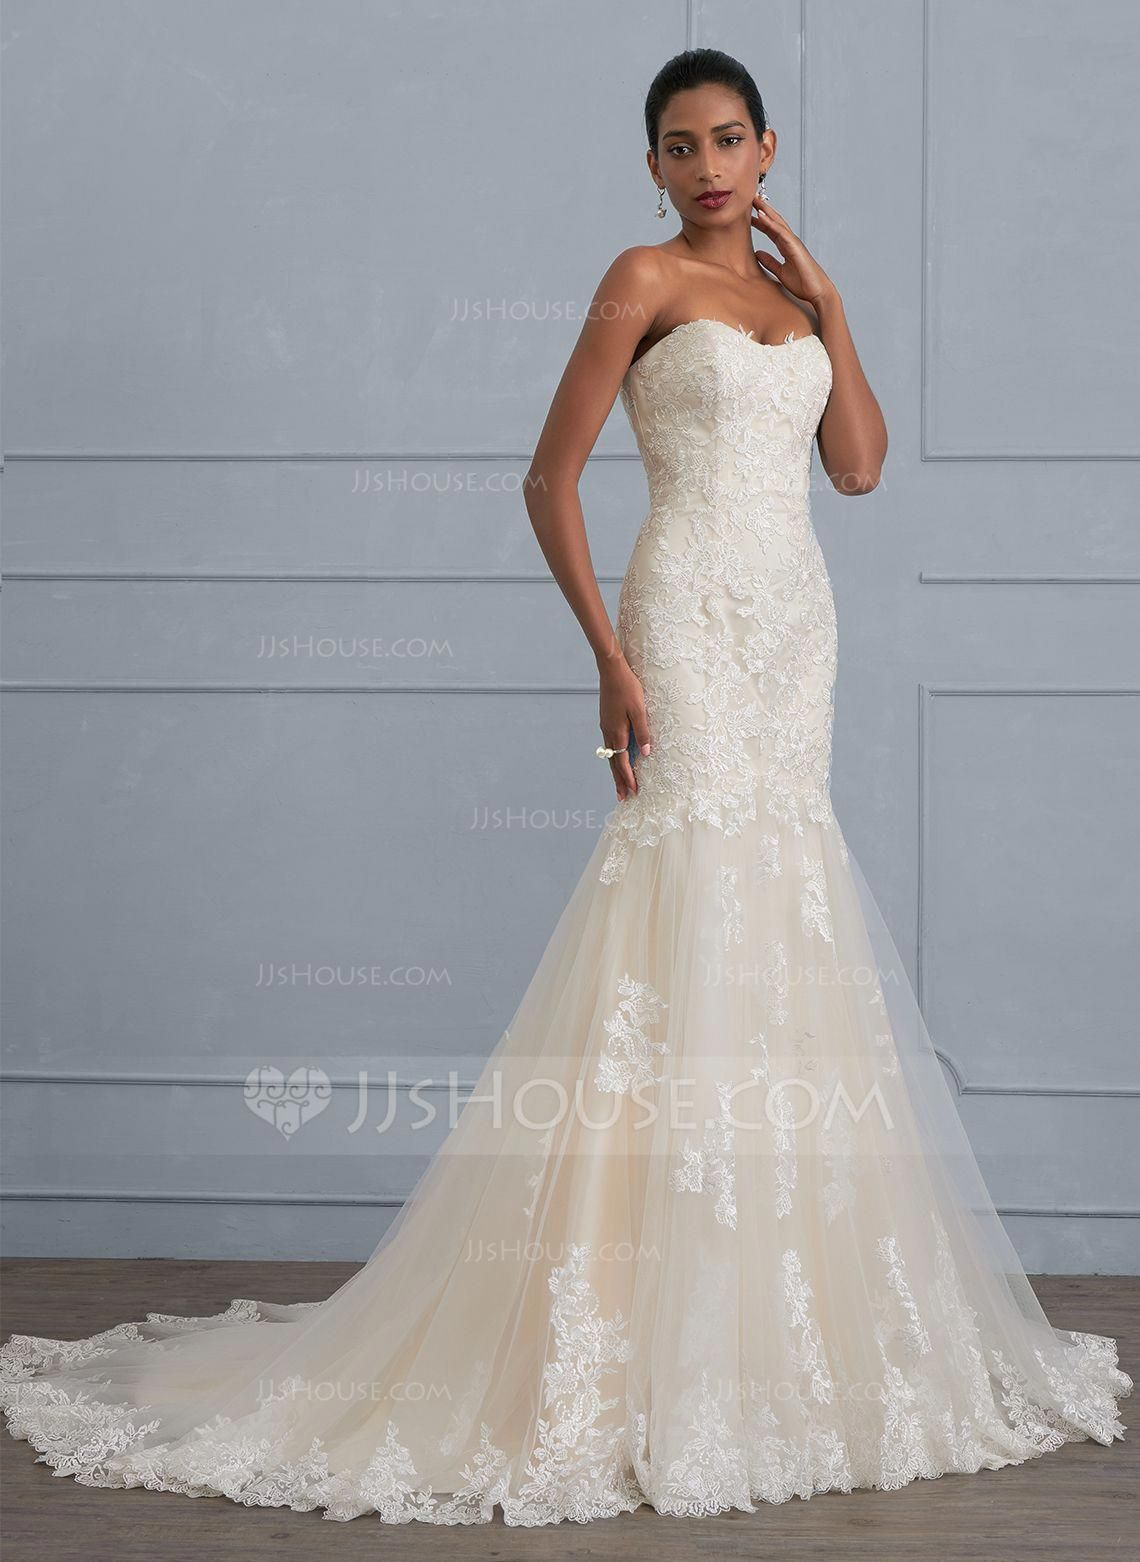 c6a795d9a609 Trumpet/Mermaid Sweetheart Court Train Tulle Lace Wedding Dress (002117031)  - Wedding Dresses - JJsHouse #laceweddingdressessweetheart